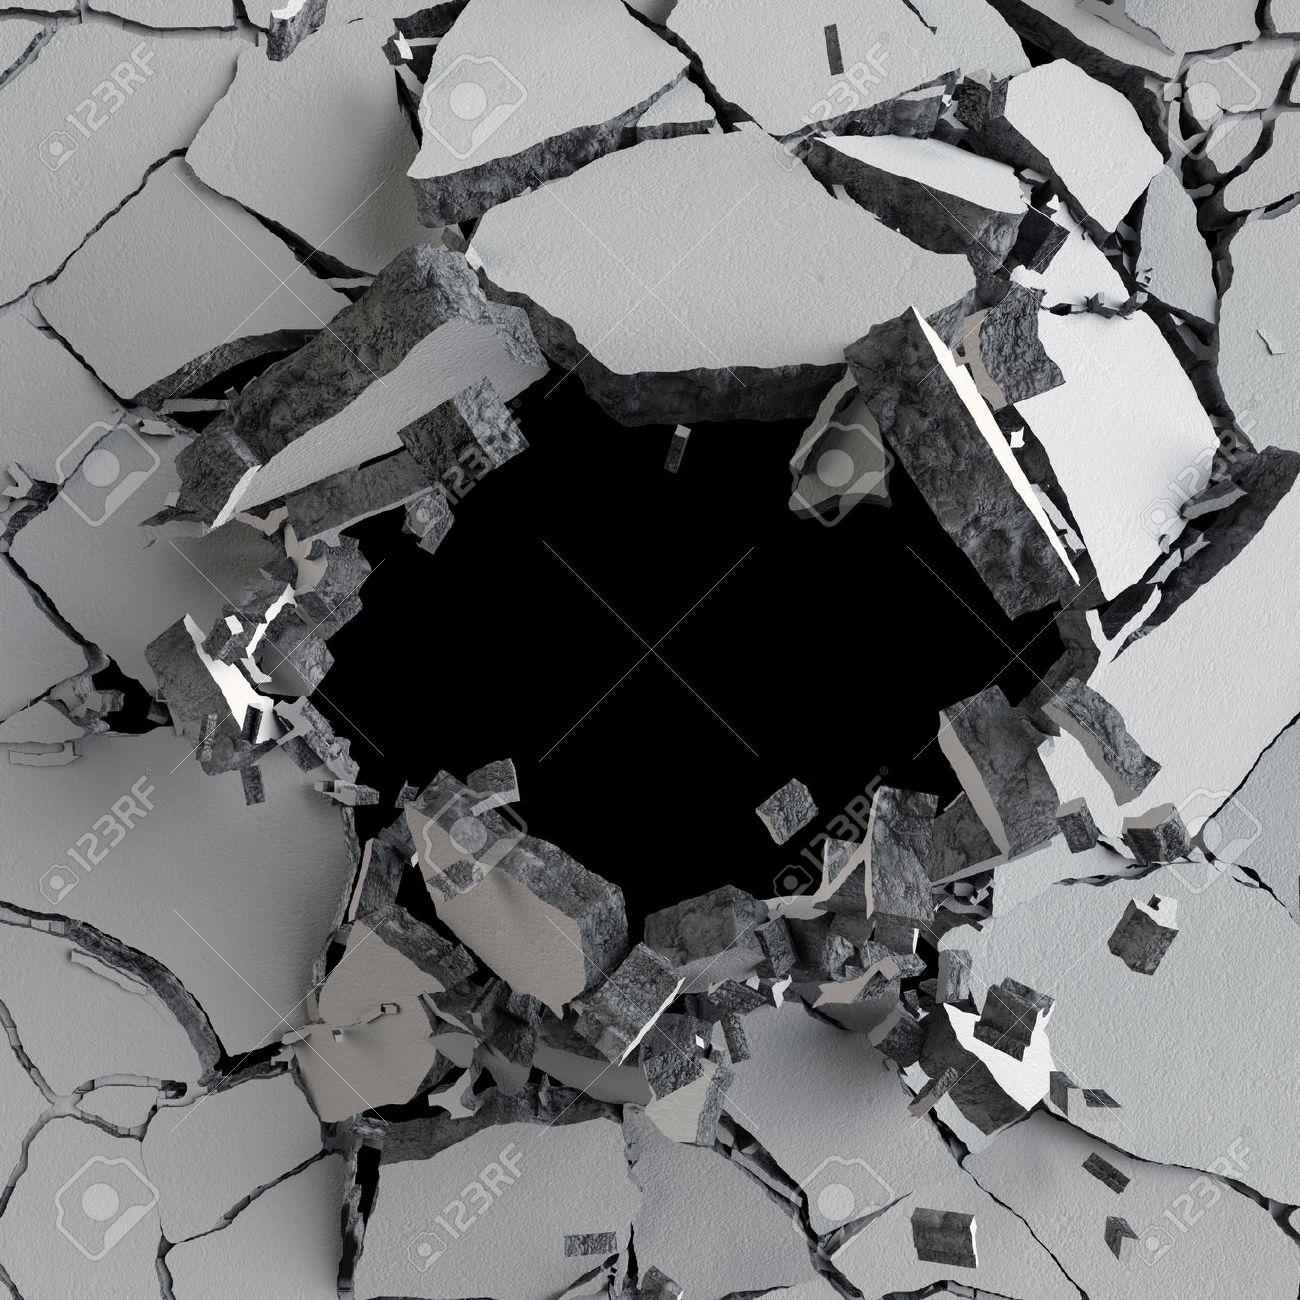 3d render, 3d illustration, explosion, cracked concrete wall, bullet hole, destruction, abstract background - 60195196